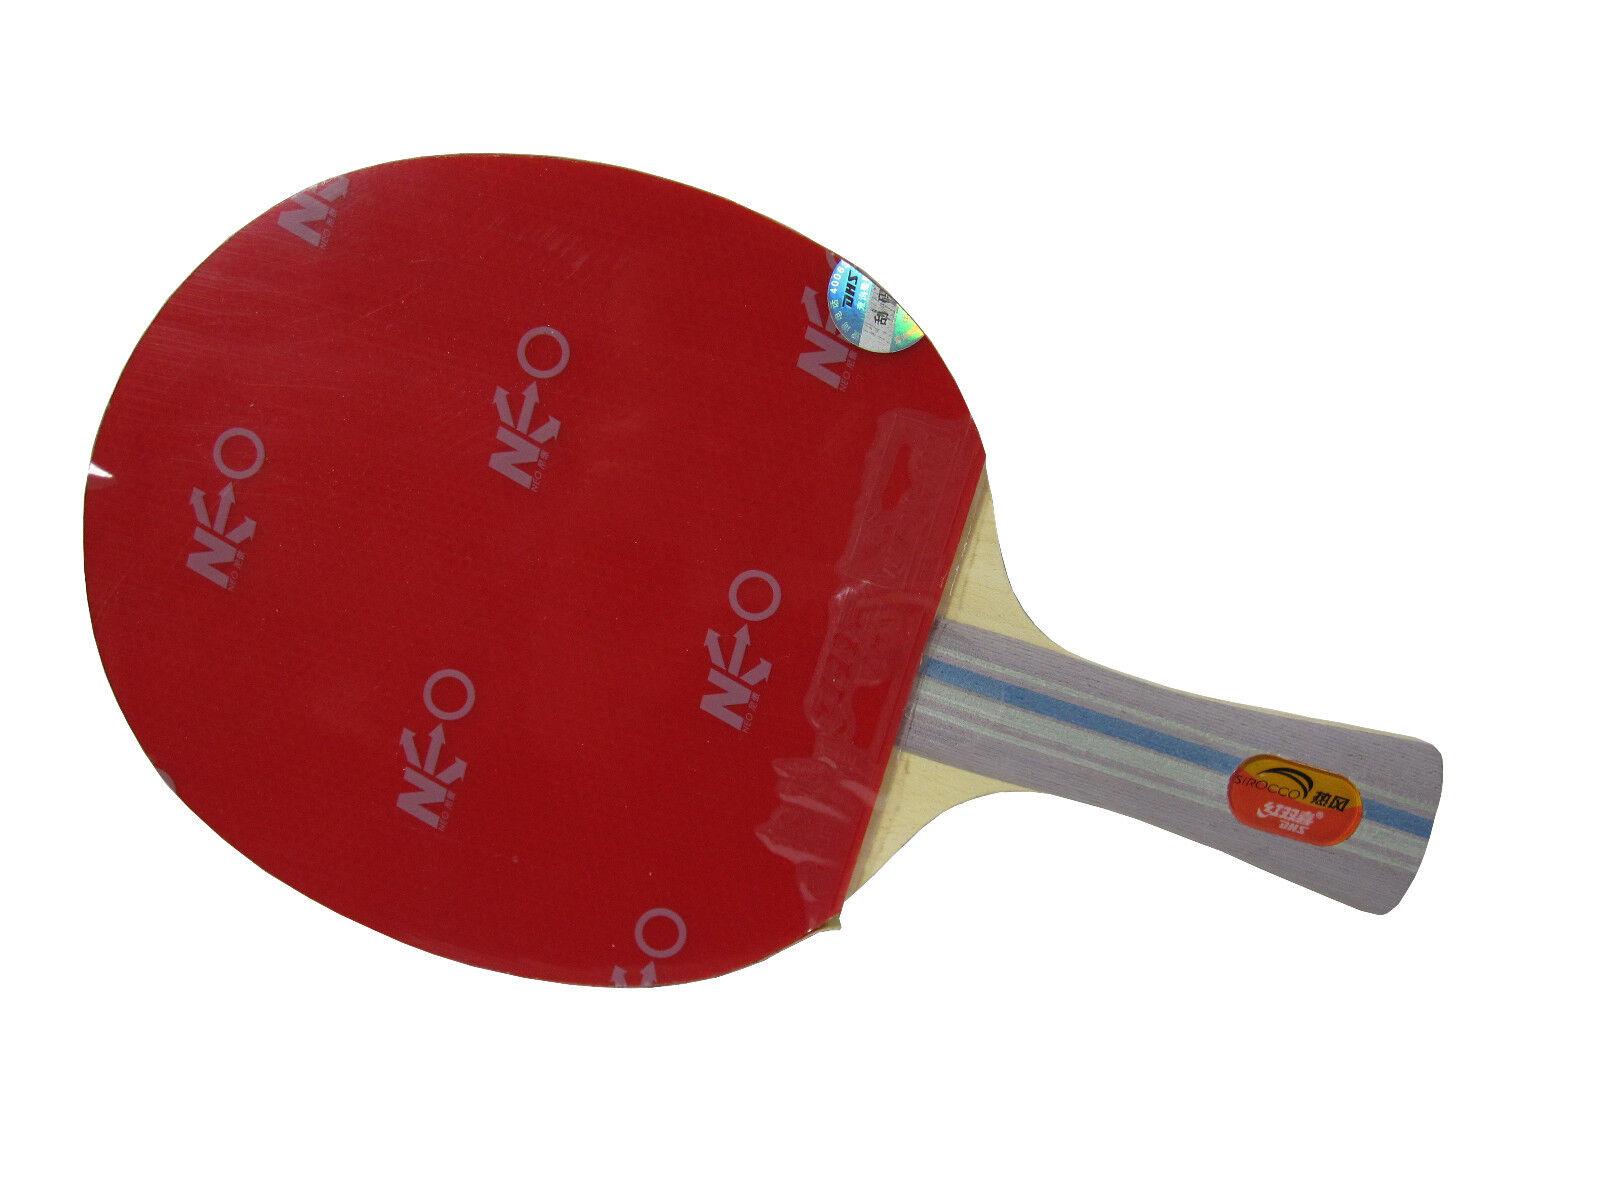 Bribar Hurricane Table Tennis Bat